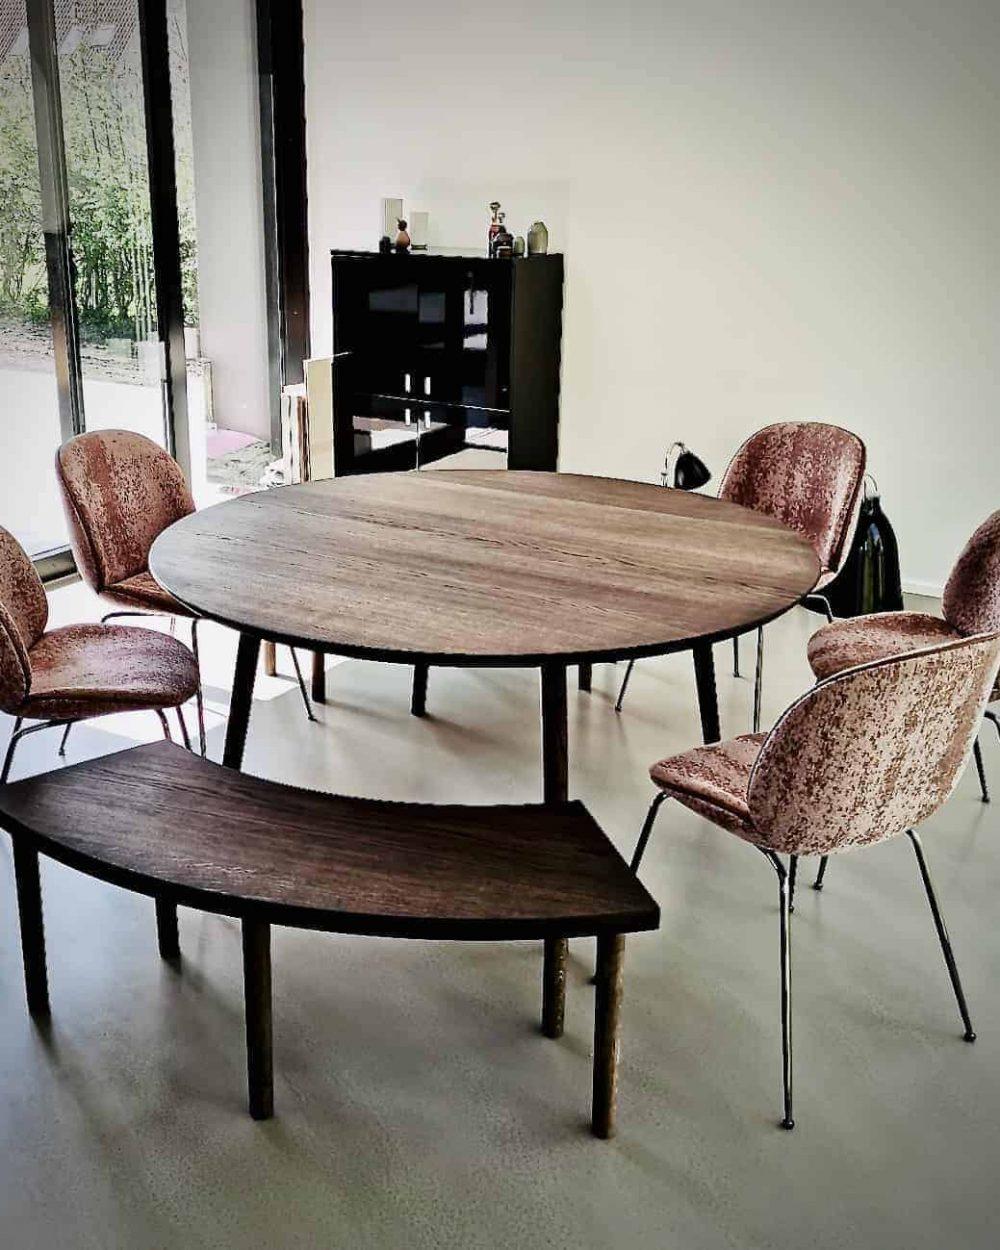 Round table round table 4 Kærbygaard kaerbygaard round round tables 2020